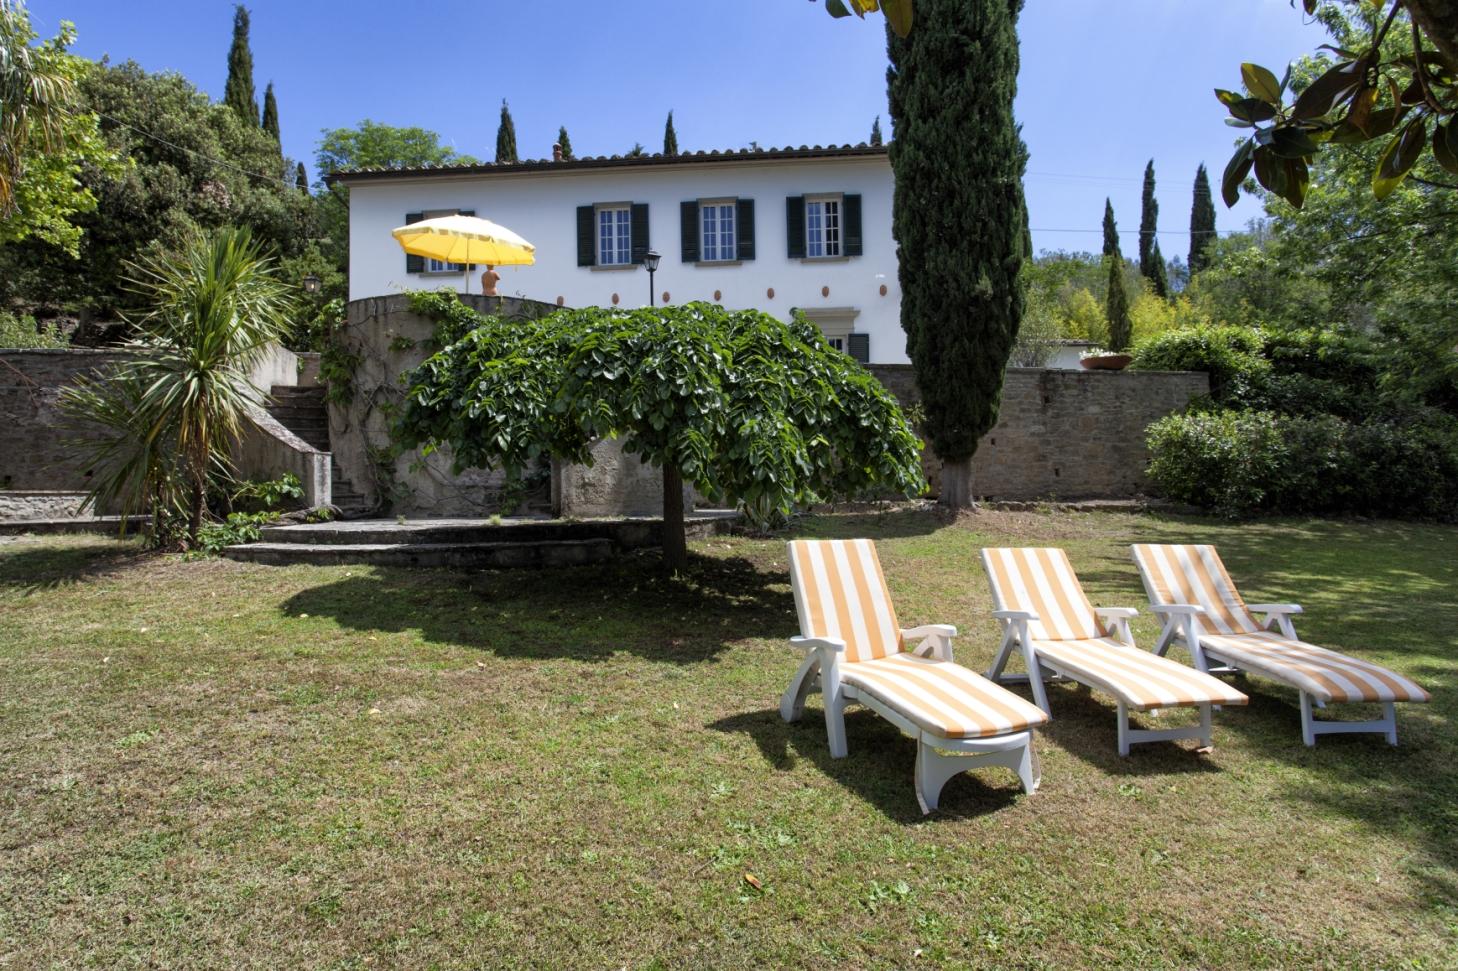 Ferienhaus Villa 6 pax (367992), Cortona, Arezzo, Toskana, Italien, Bild 5